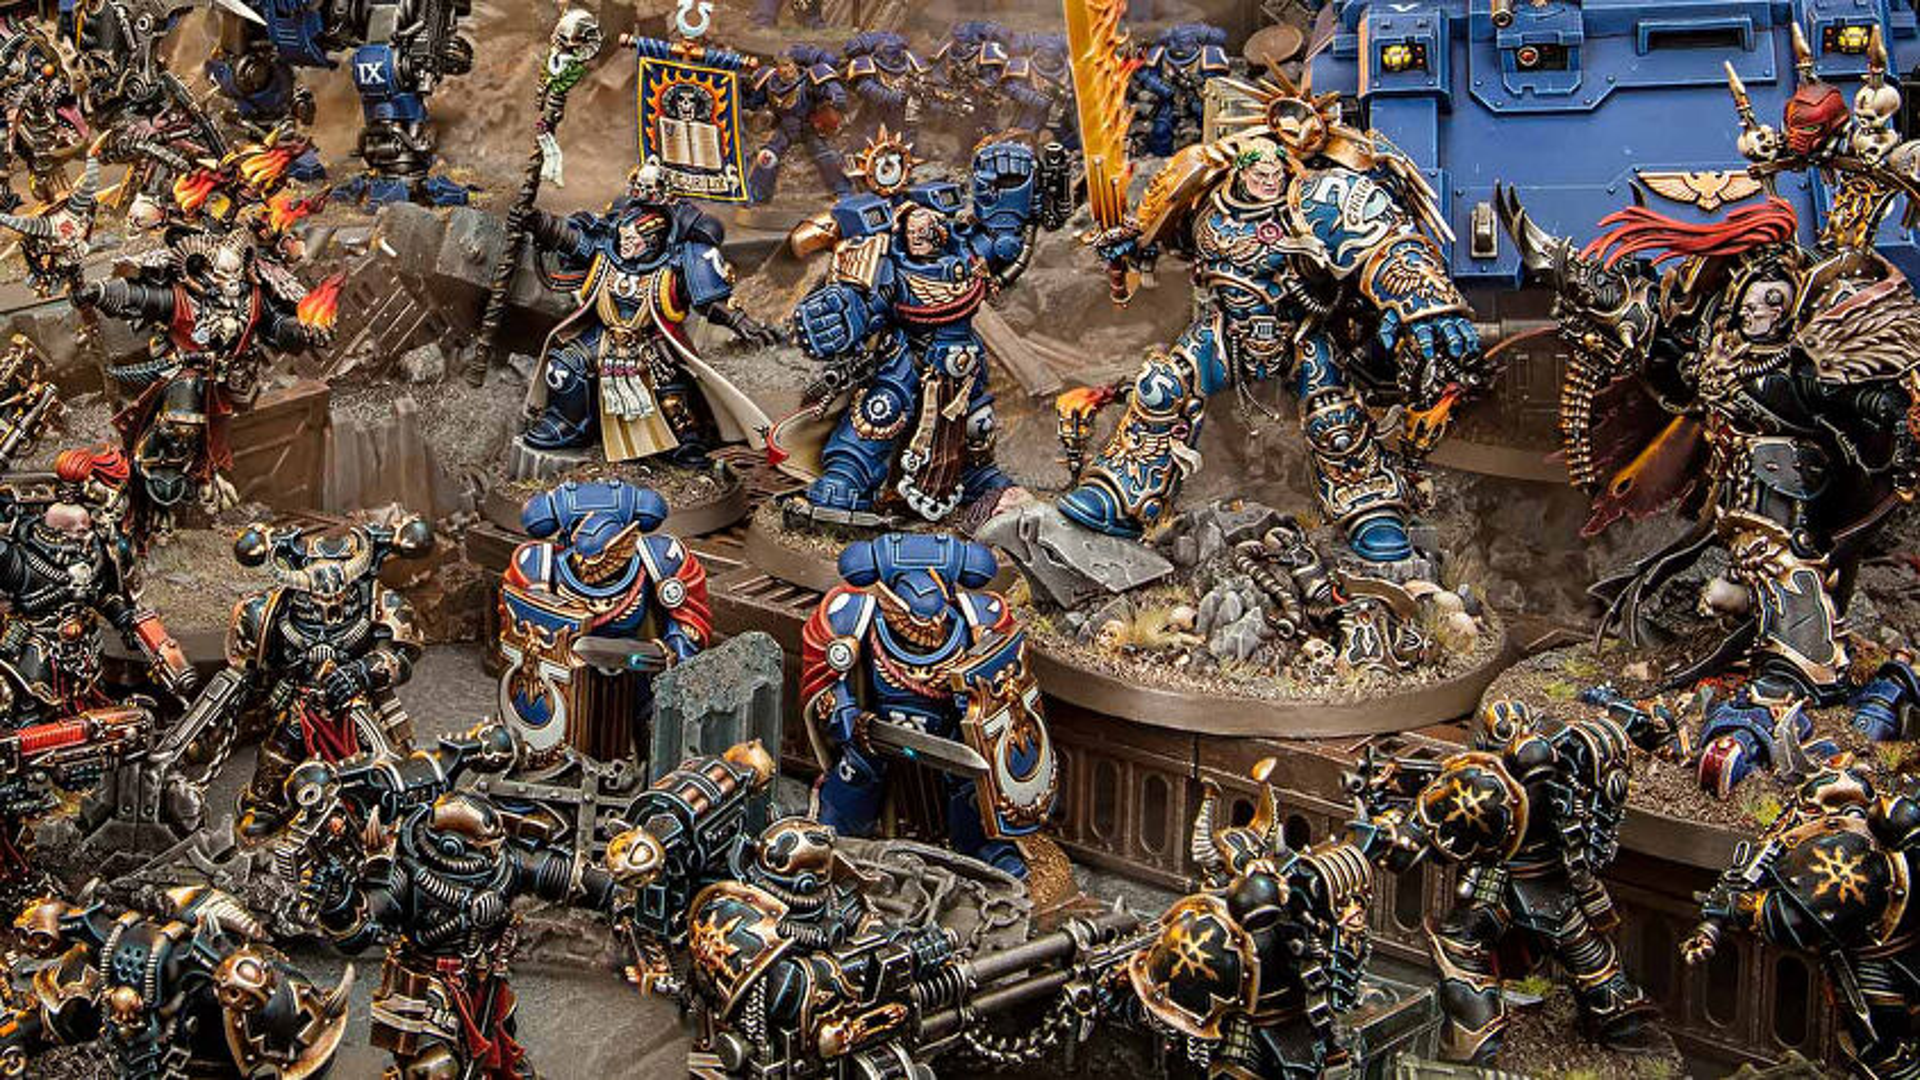 Warhammer 40K miniatures game miniatures image 1